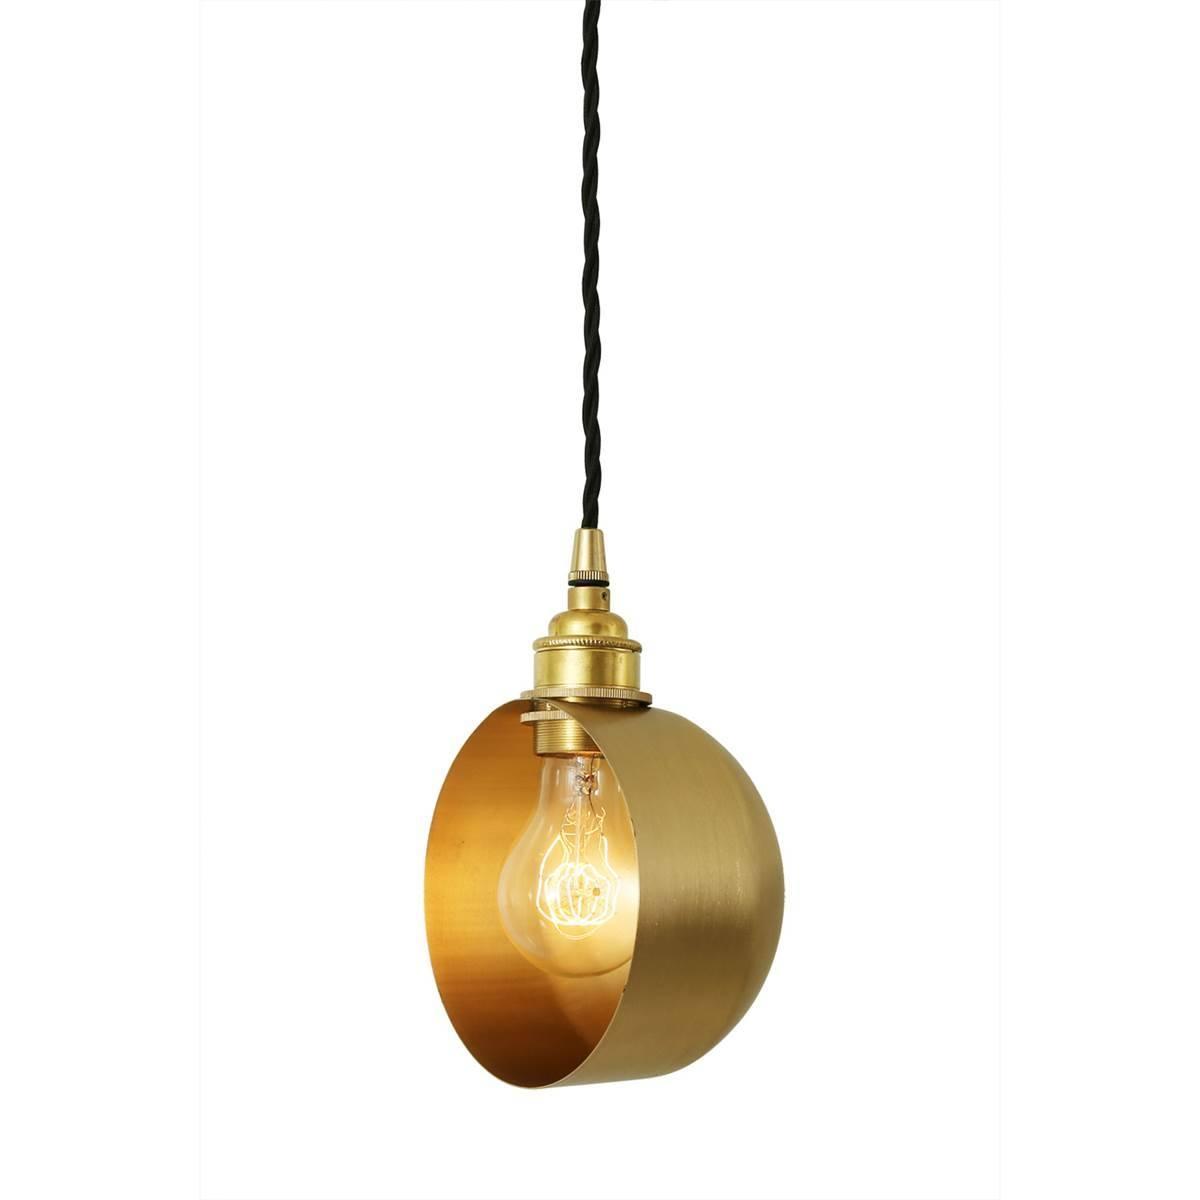 Bogota Modern Pendant Light | Mullan Lighting regarding Quirky Pendant Lights (Image 8 of 15)